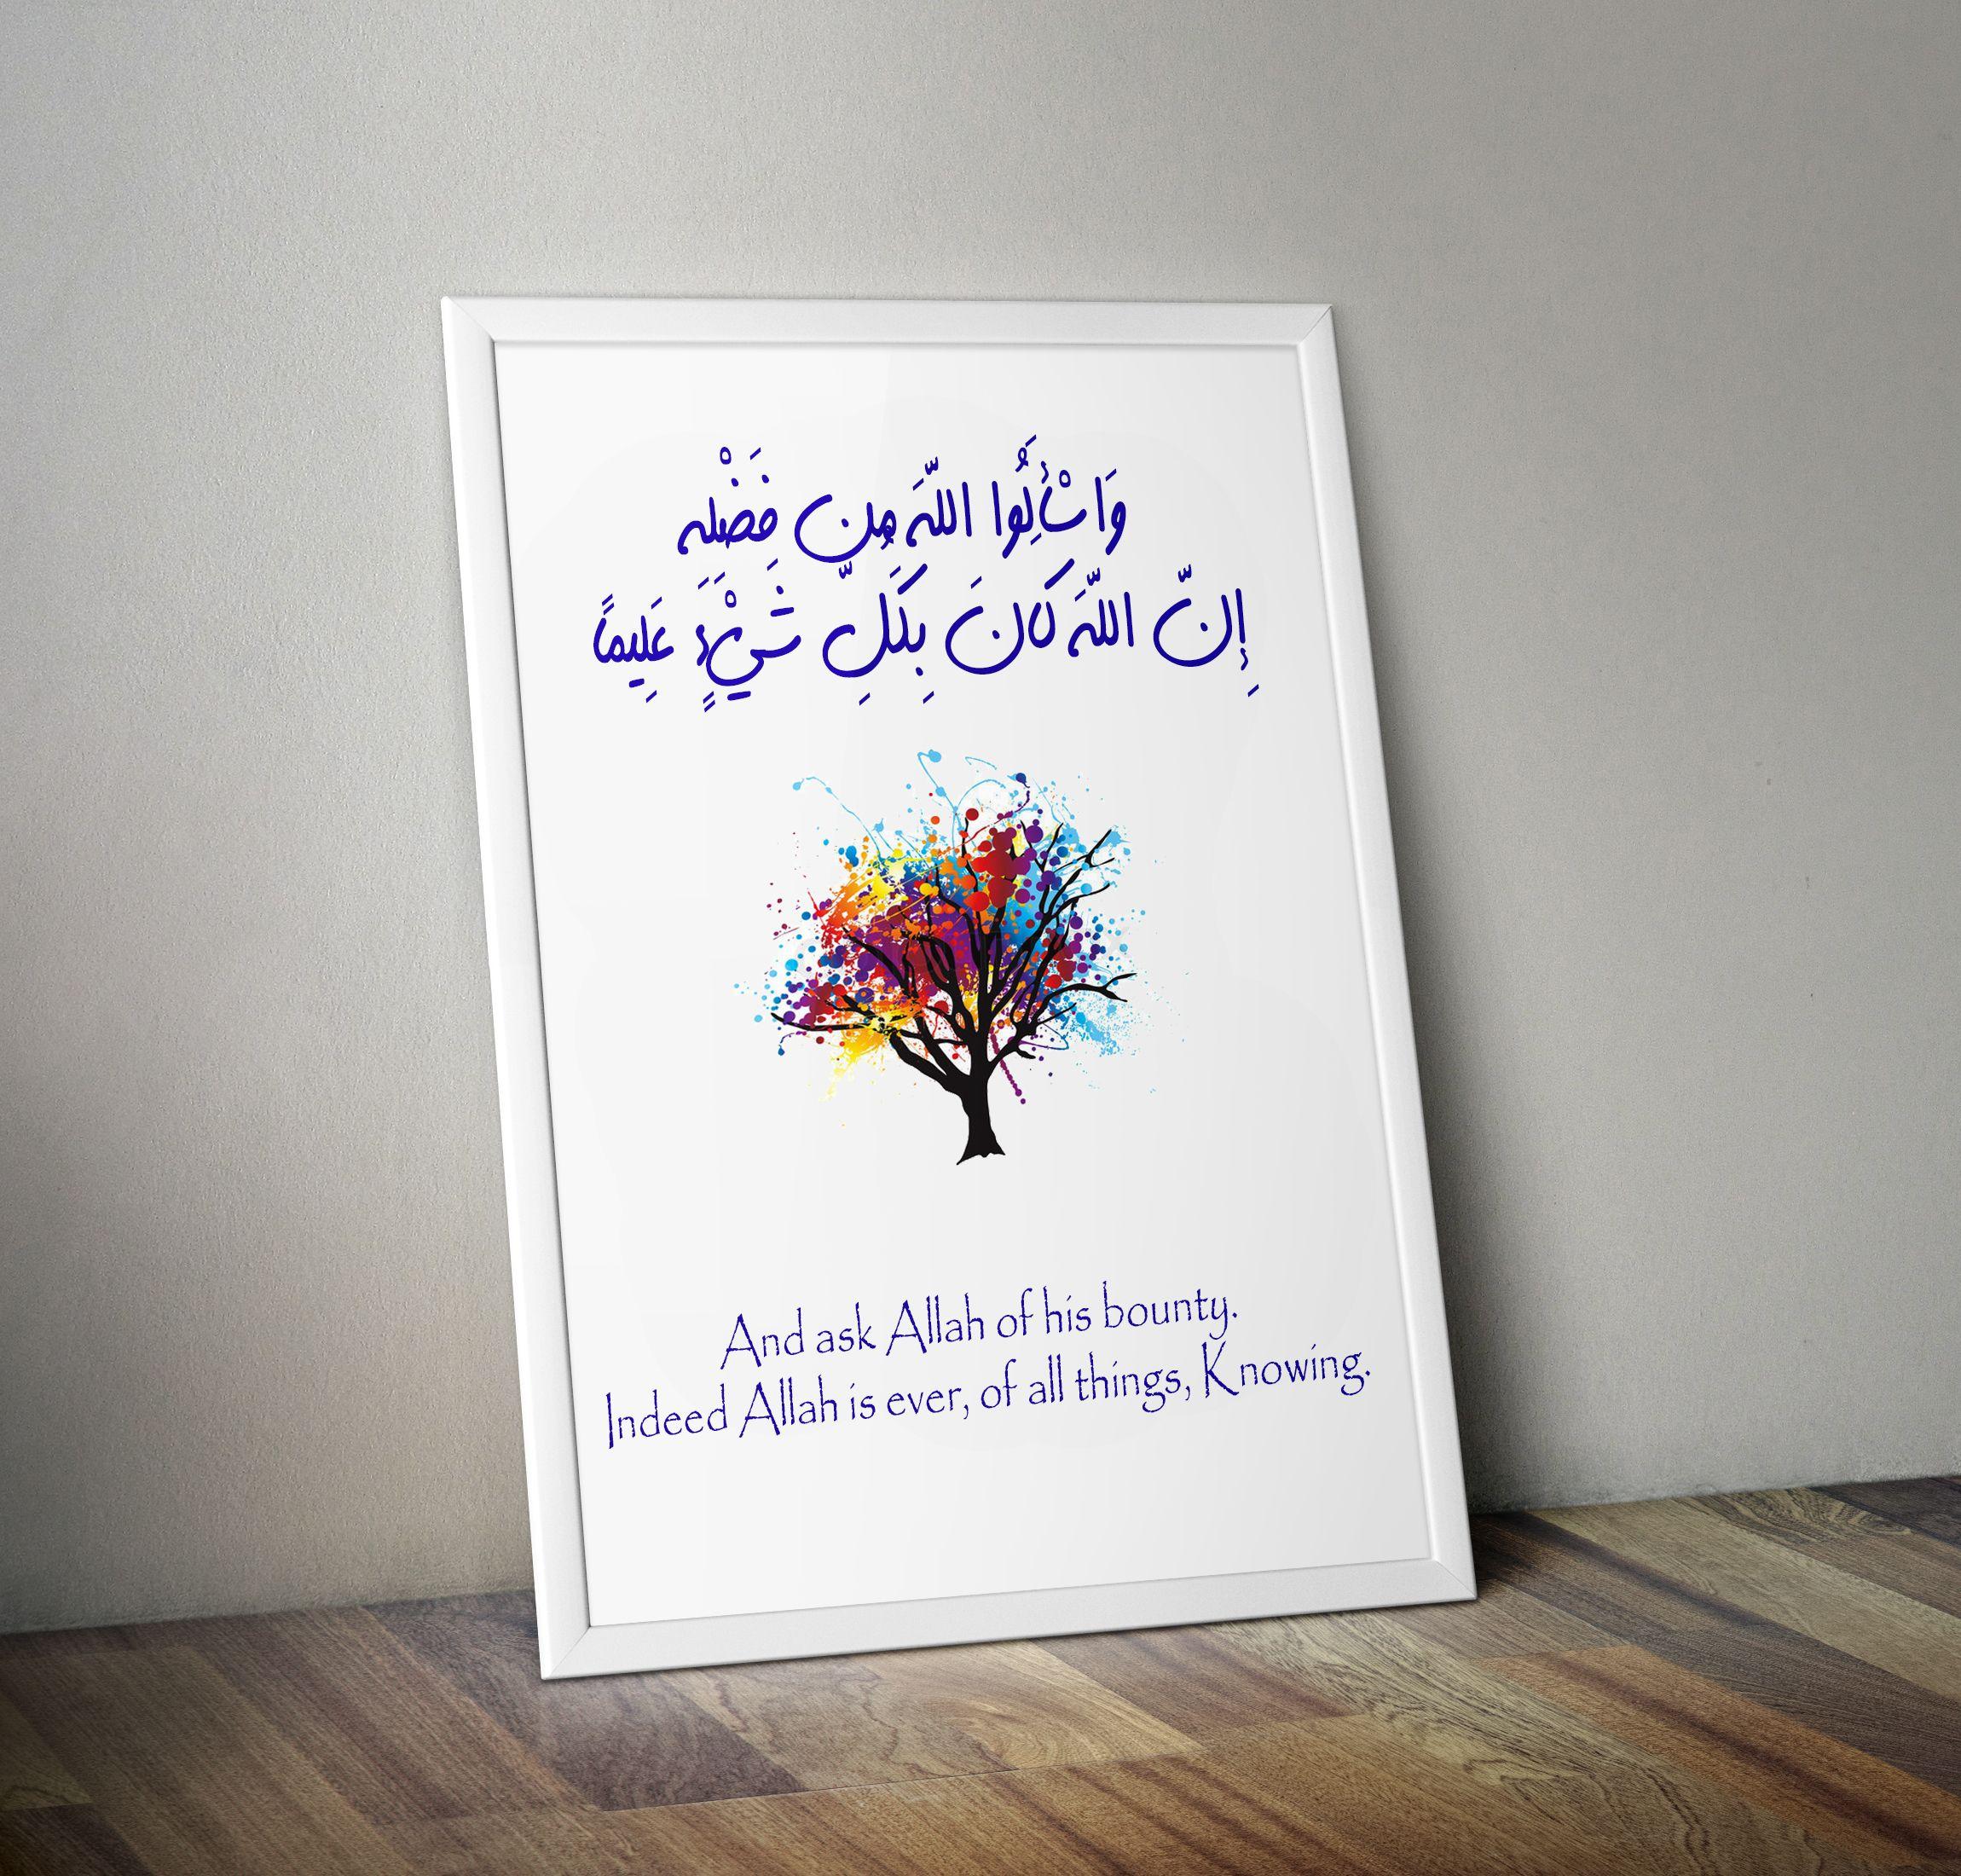 و اس أ ل وا الل ه م ن ف ض ل ه إ ن الل ه ك ان ب ك ل ش ي ء ع ل يم ا 32 And Ask Allah Of His Bounty Indeed Allah Is Book Cover All Things Books